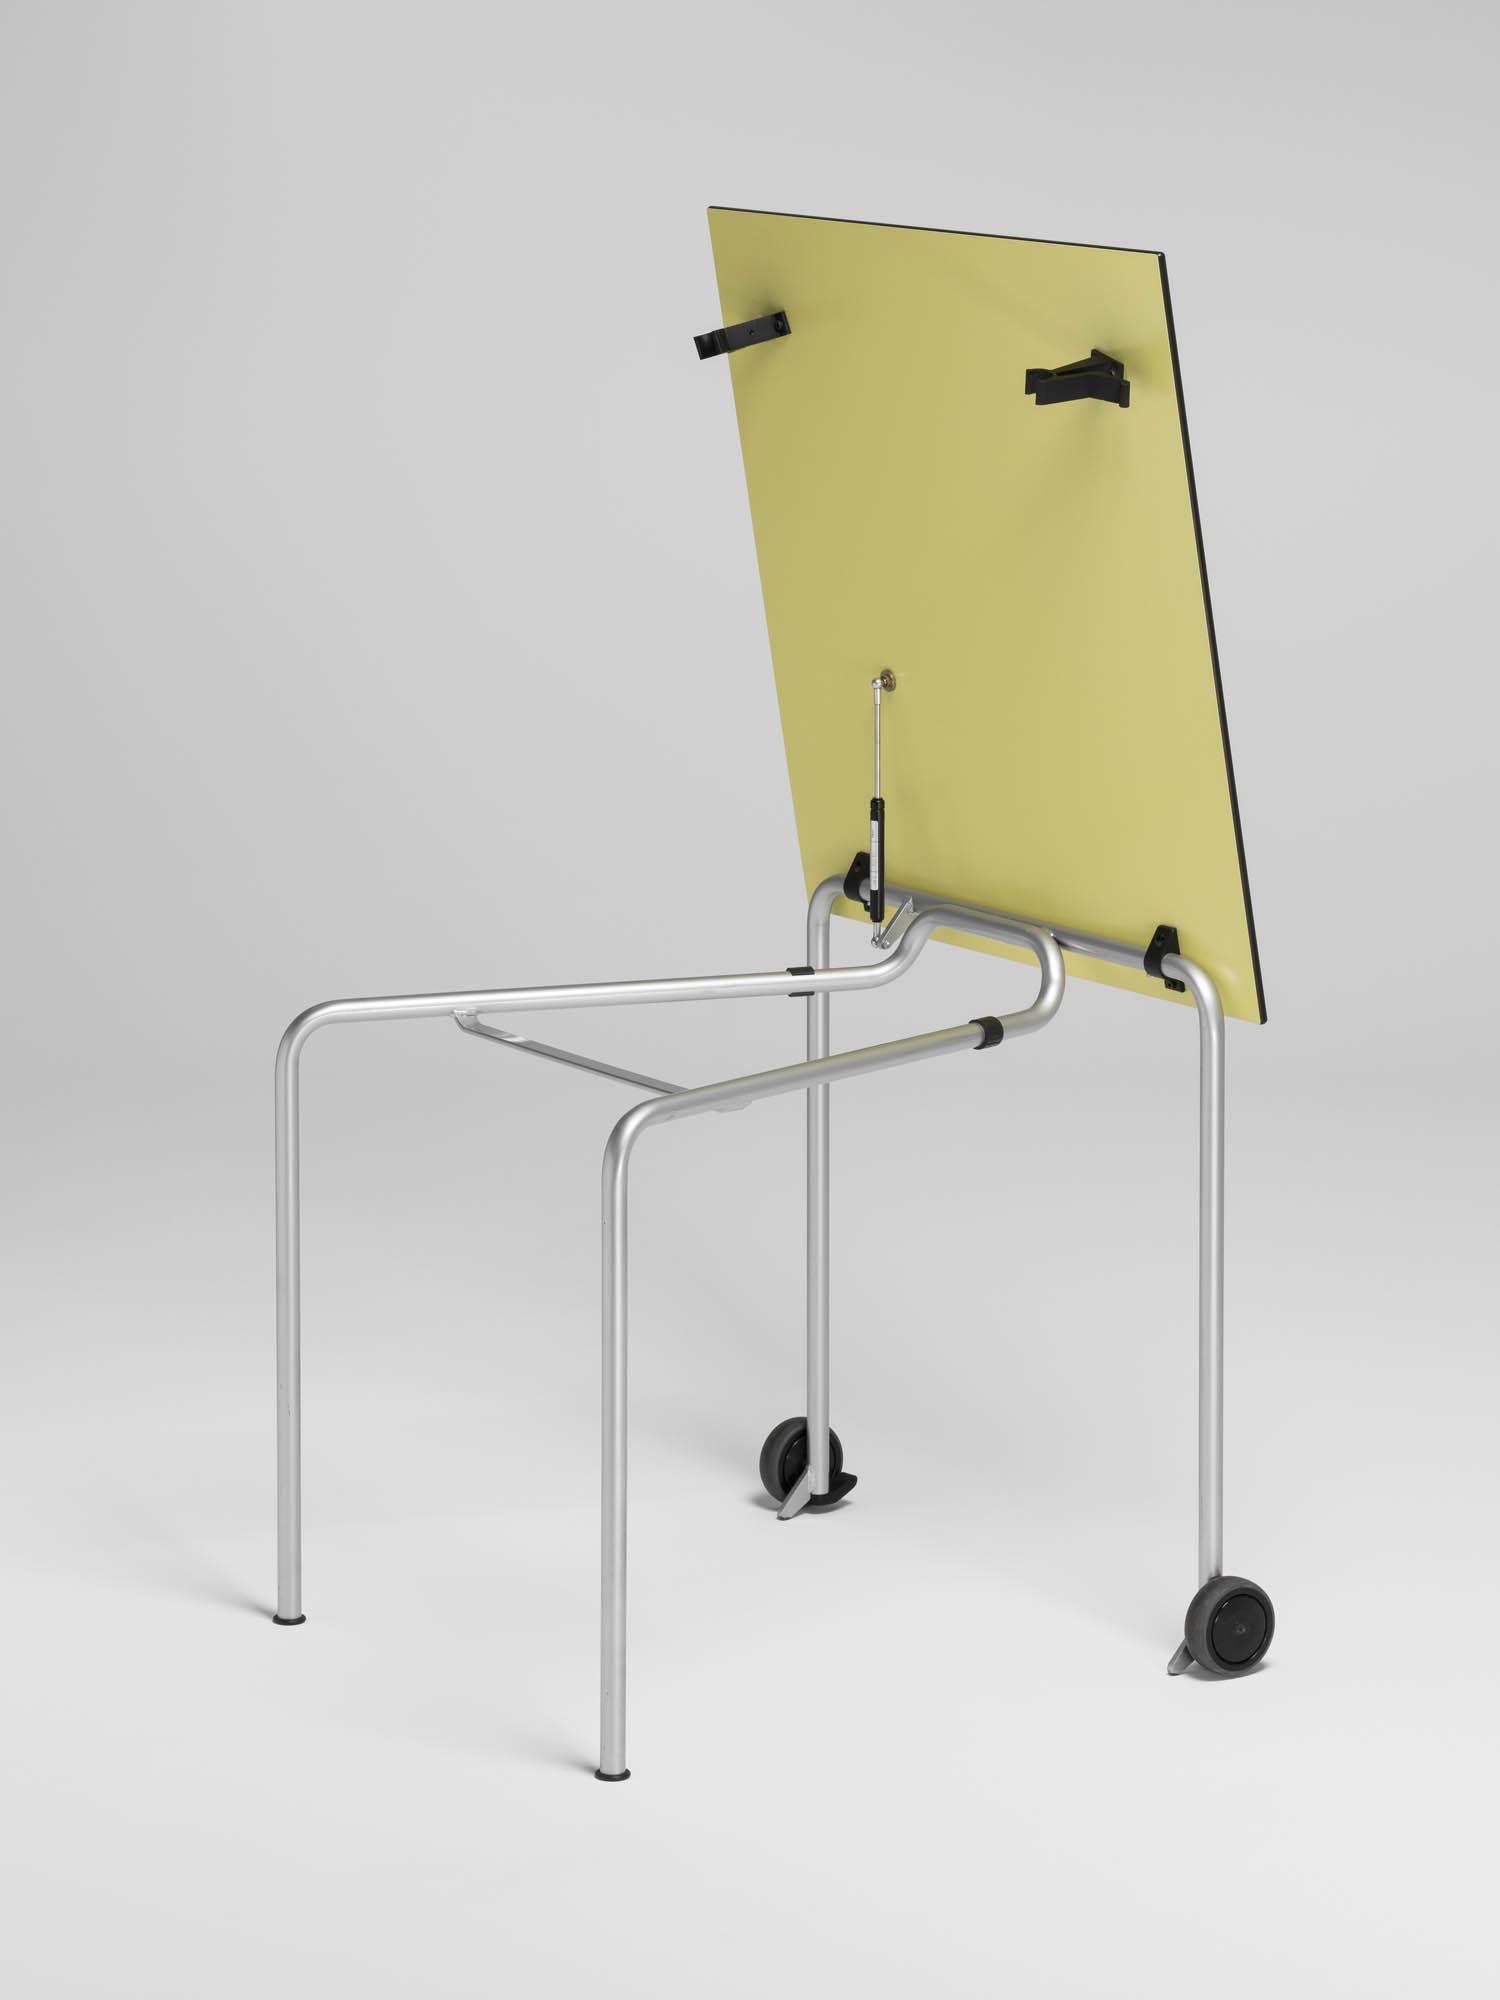 Move it, Prototyp Alfredo Häberli Christophe Marchand